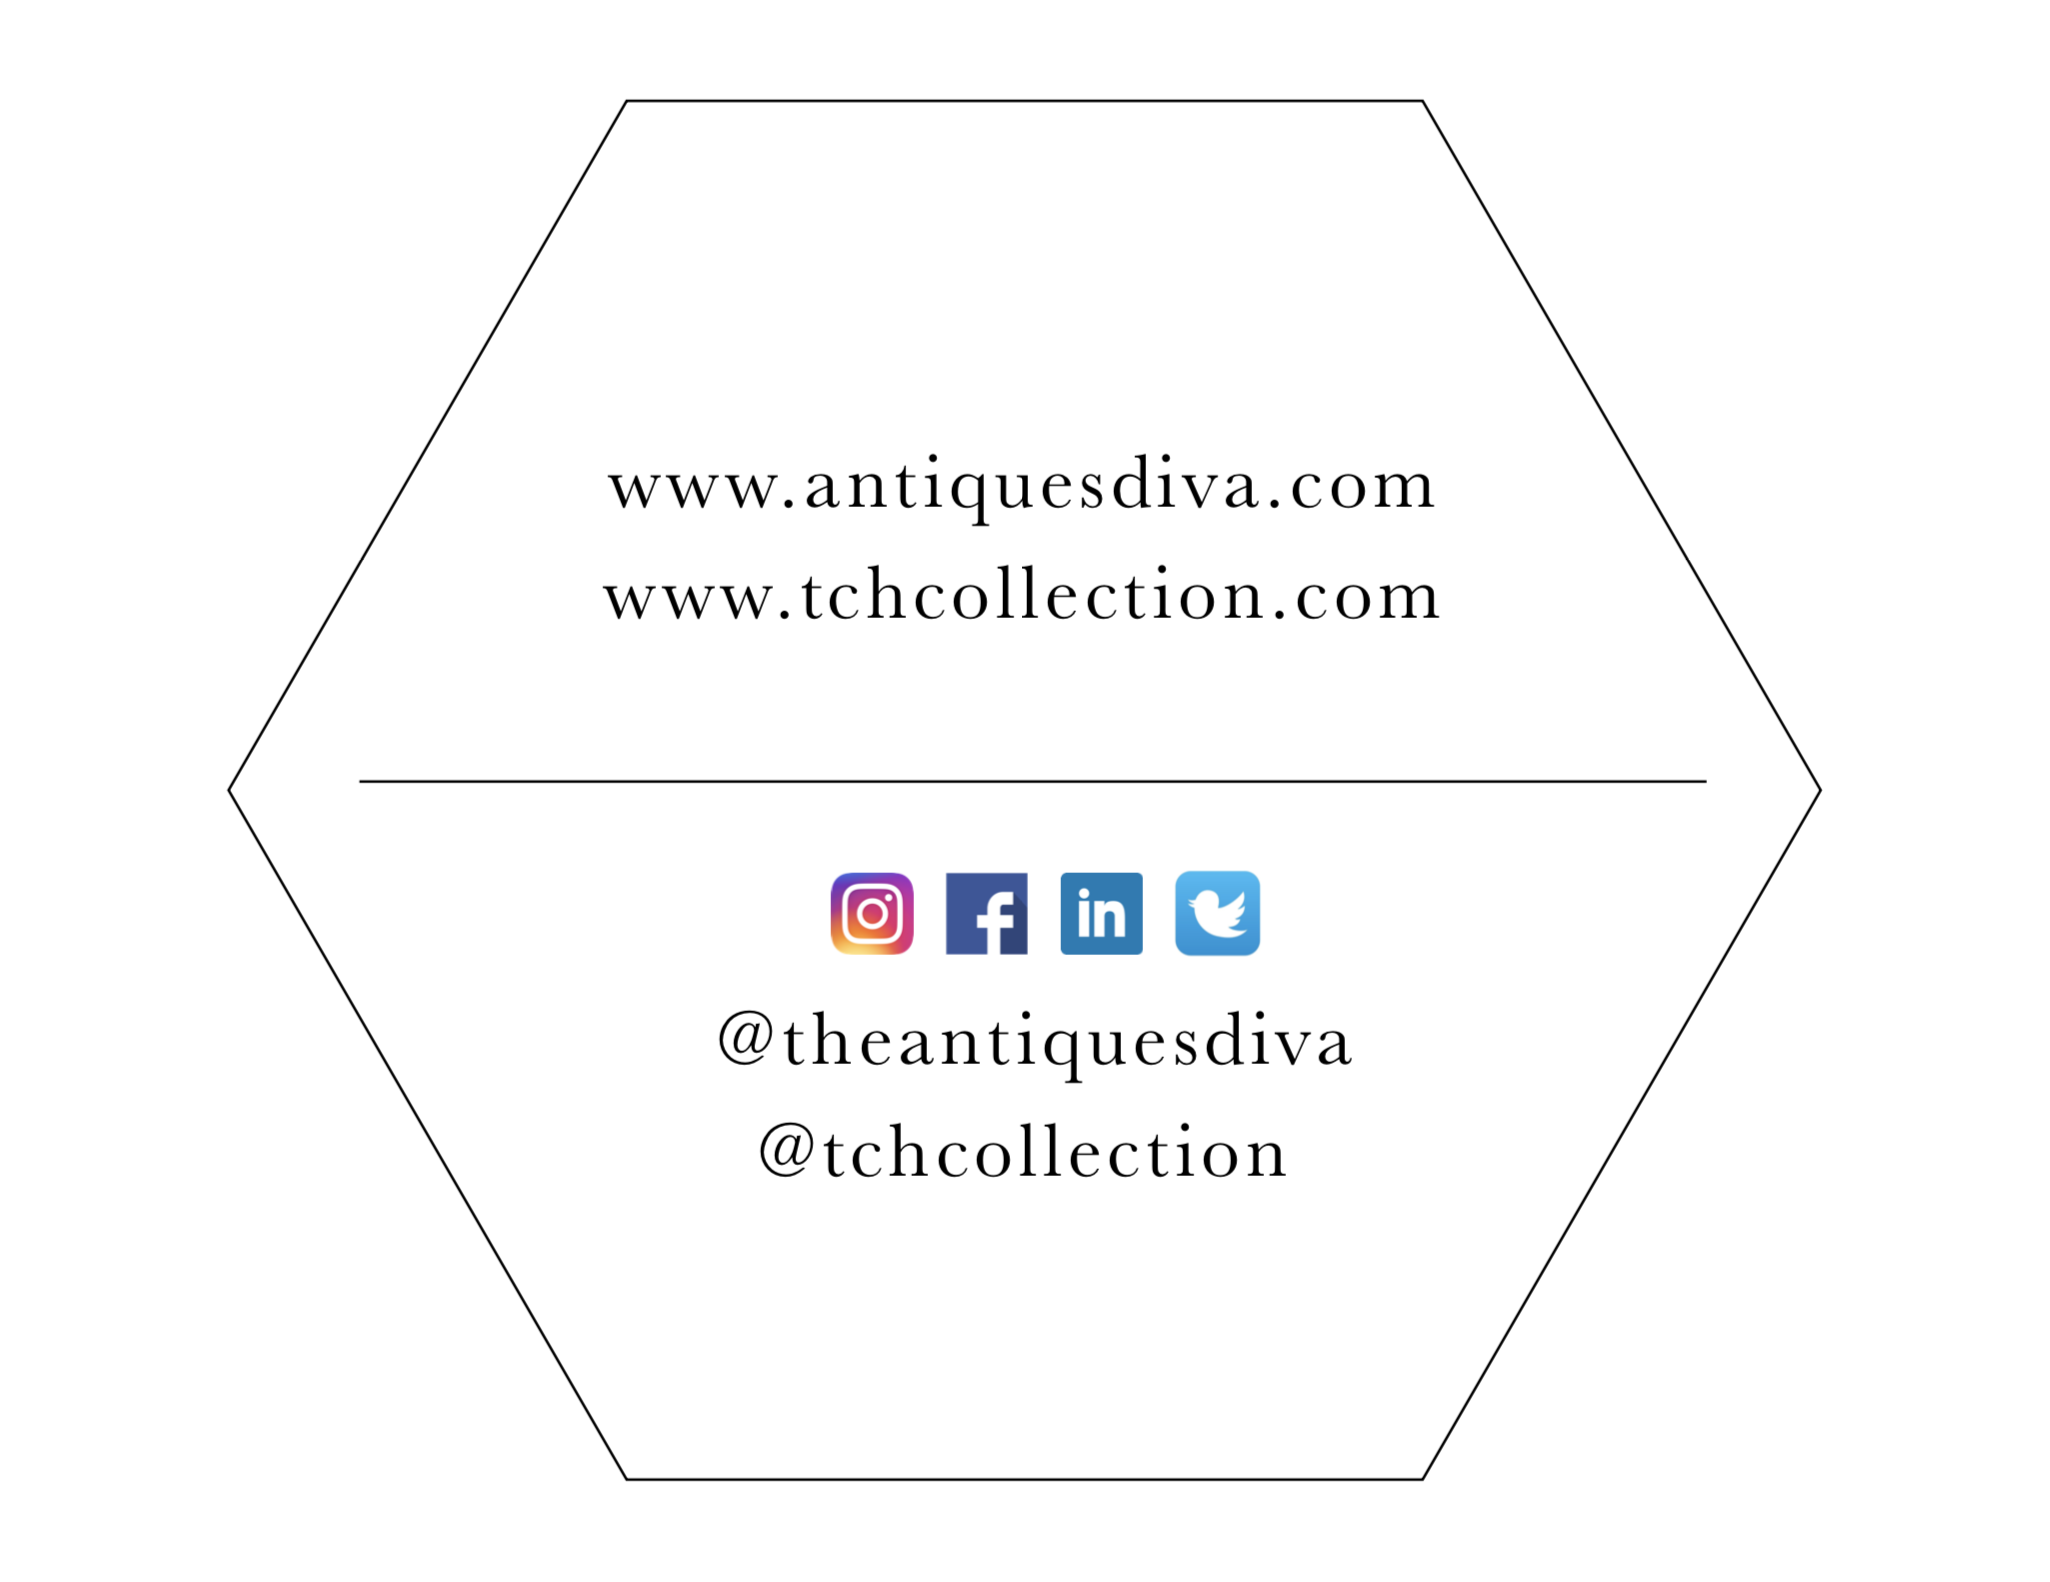 antiques diva press kit - sarah pottharst creative consultant 9.png